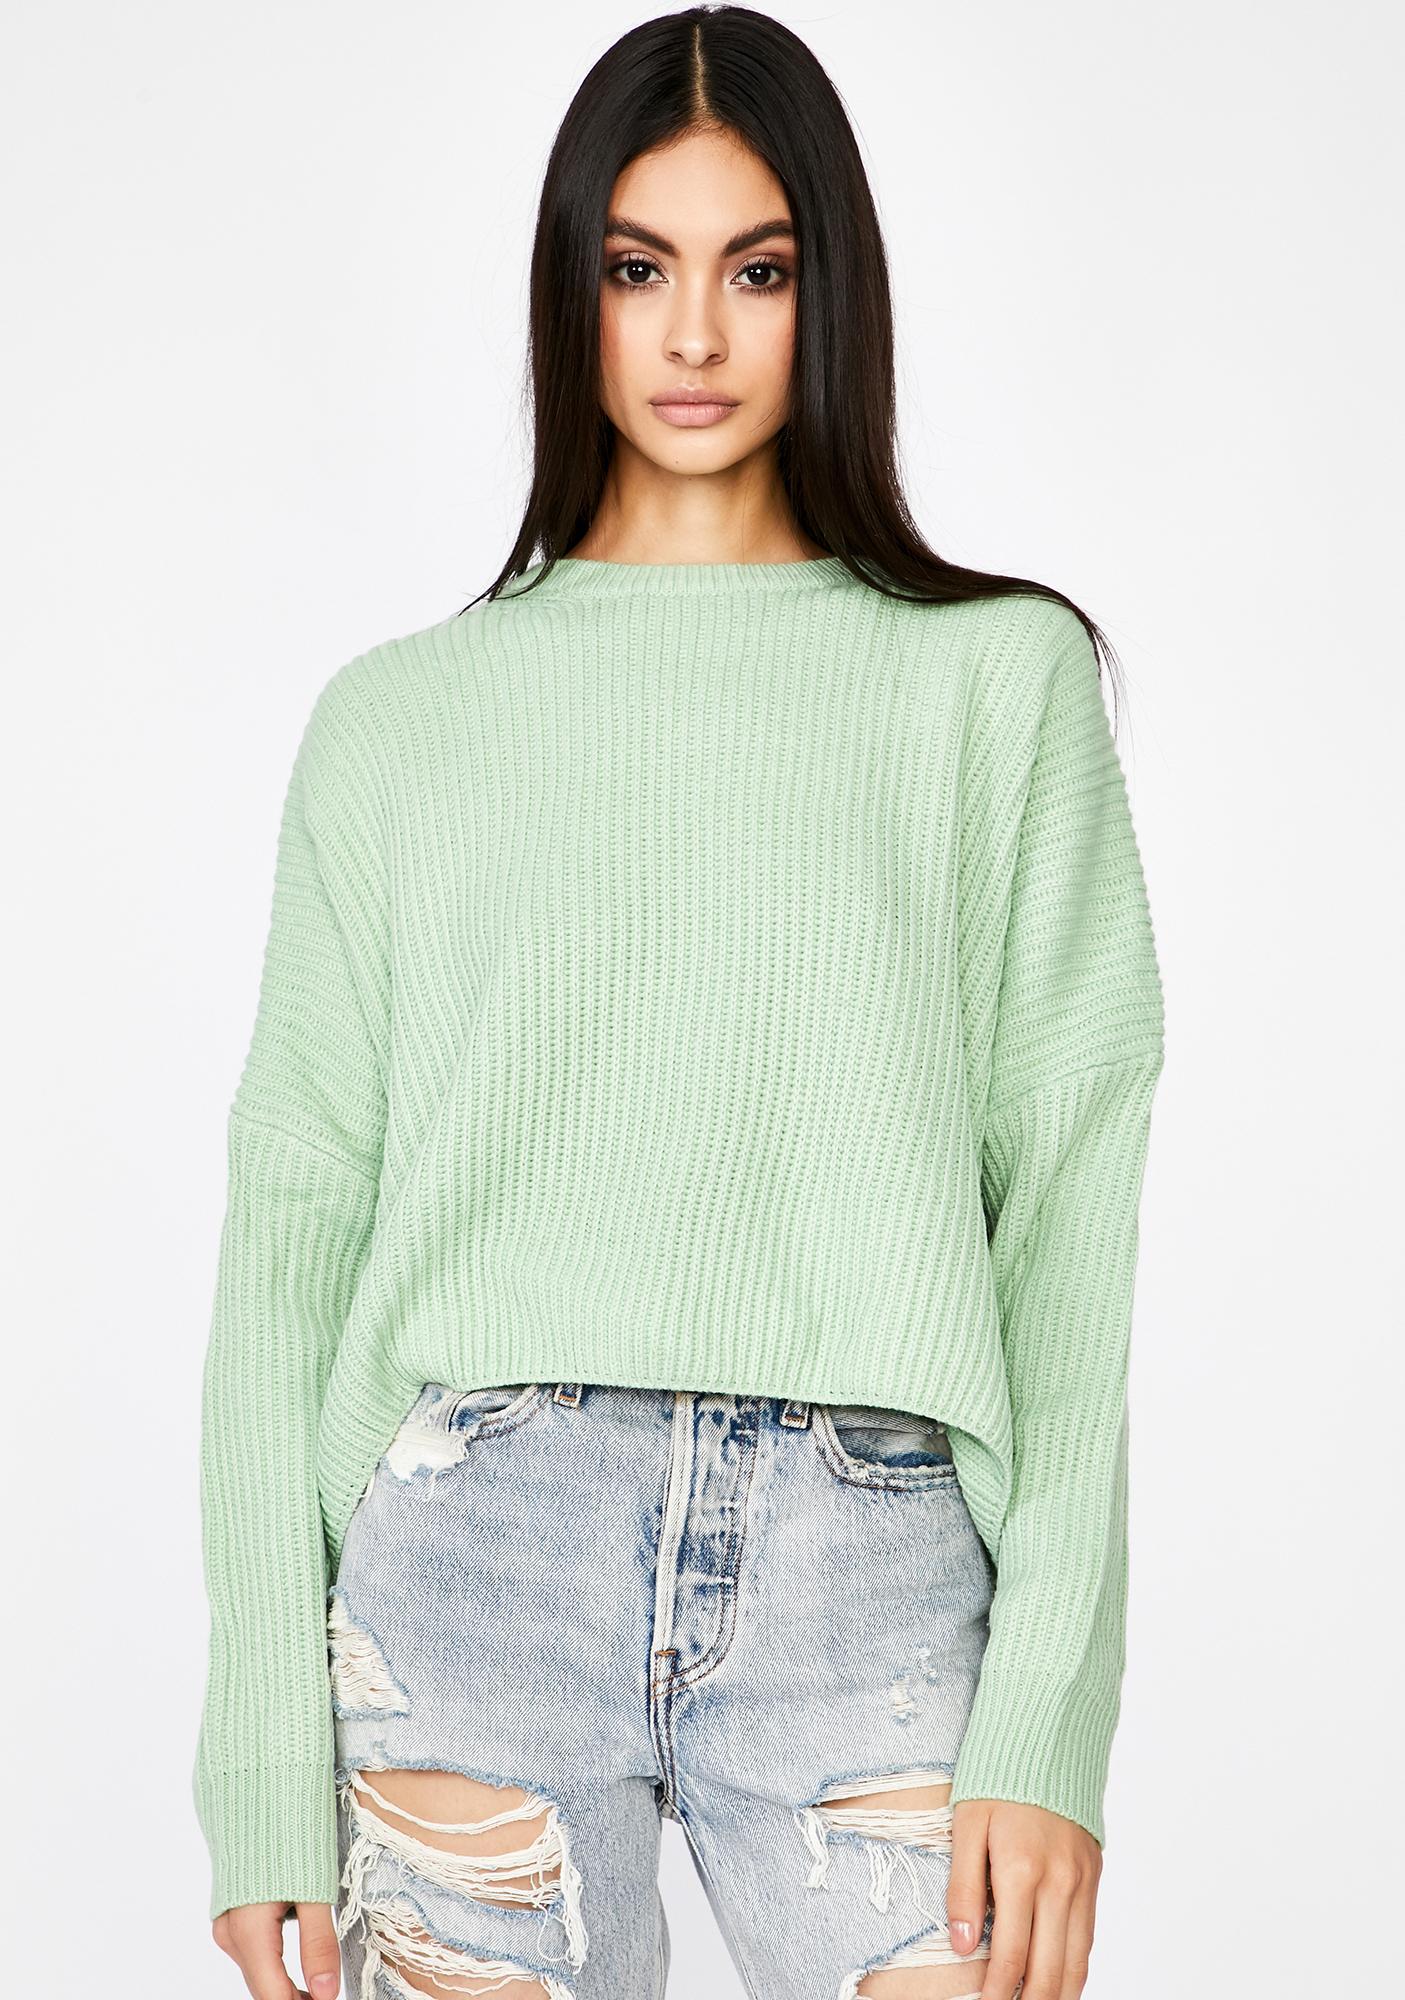 Dank Realer Than Real Crop Sweater